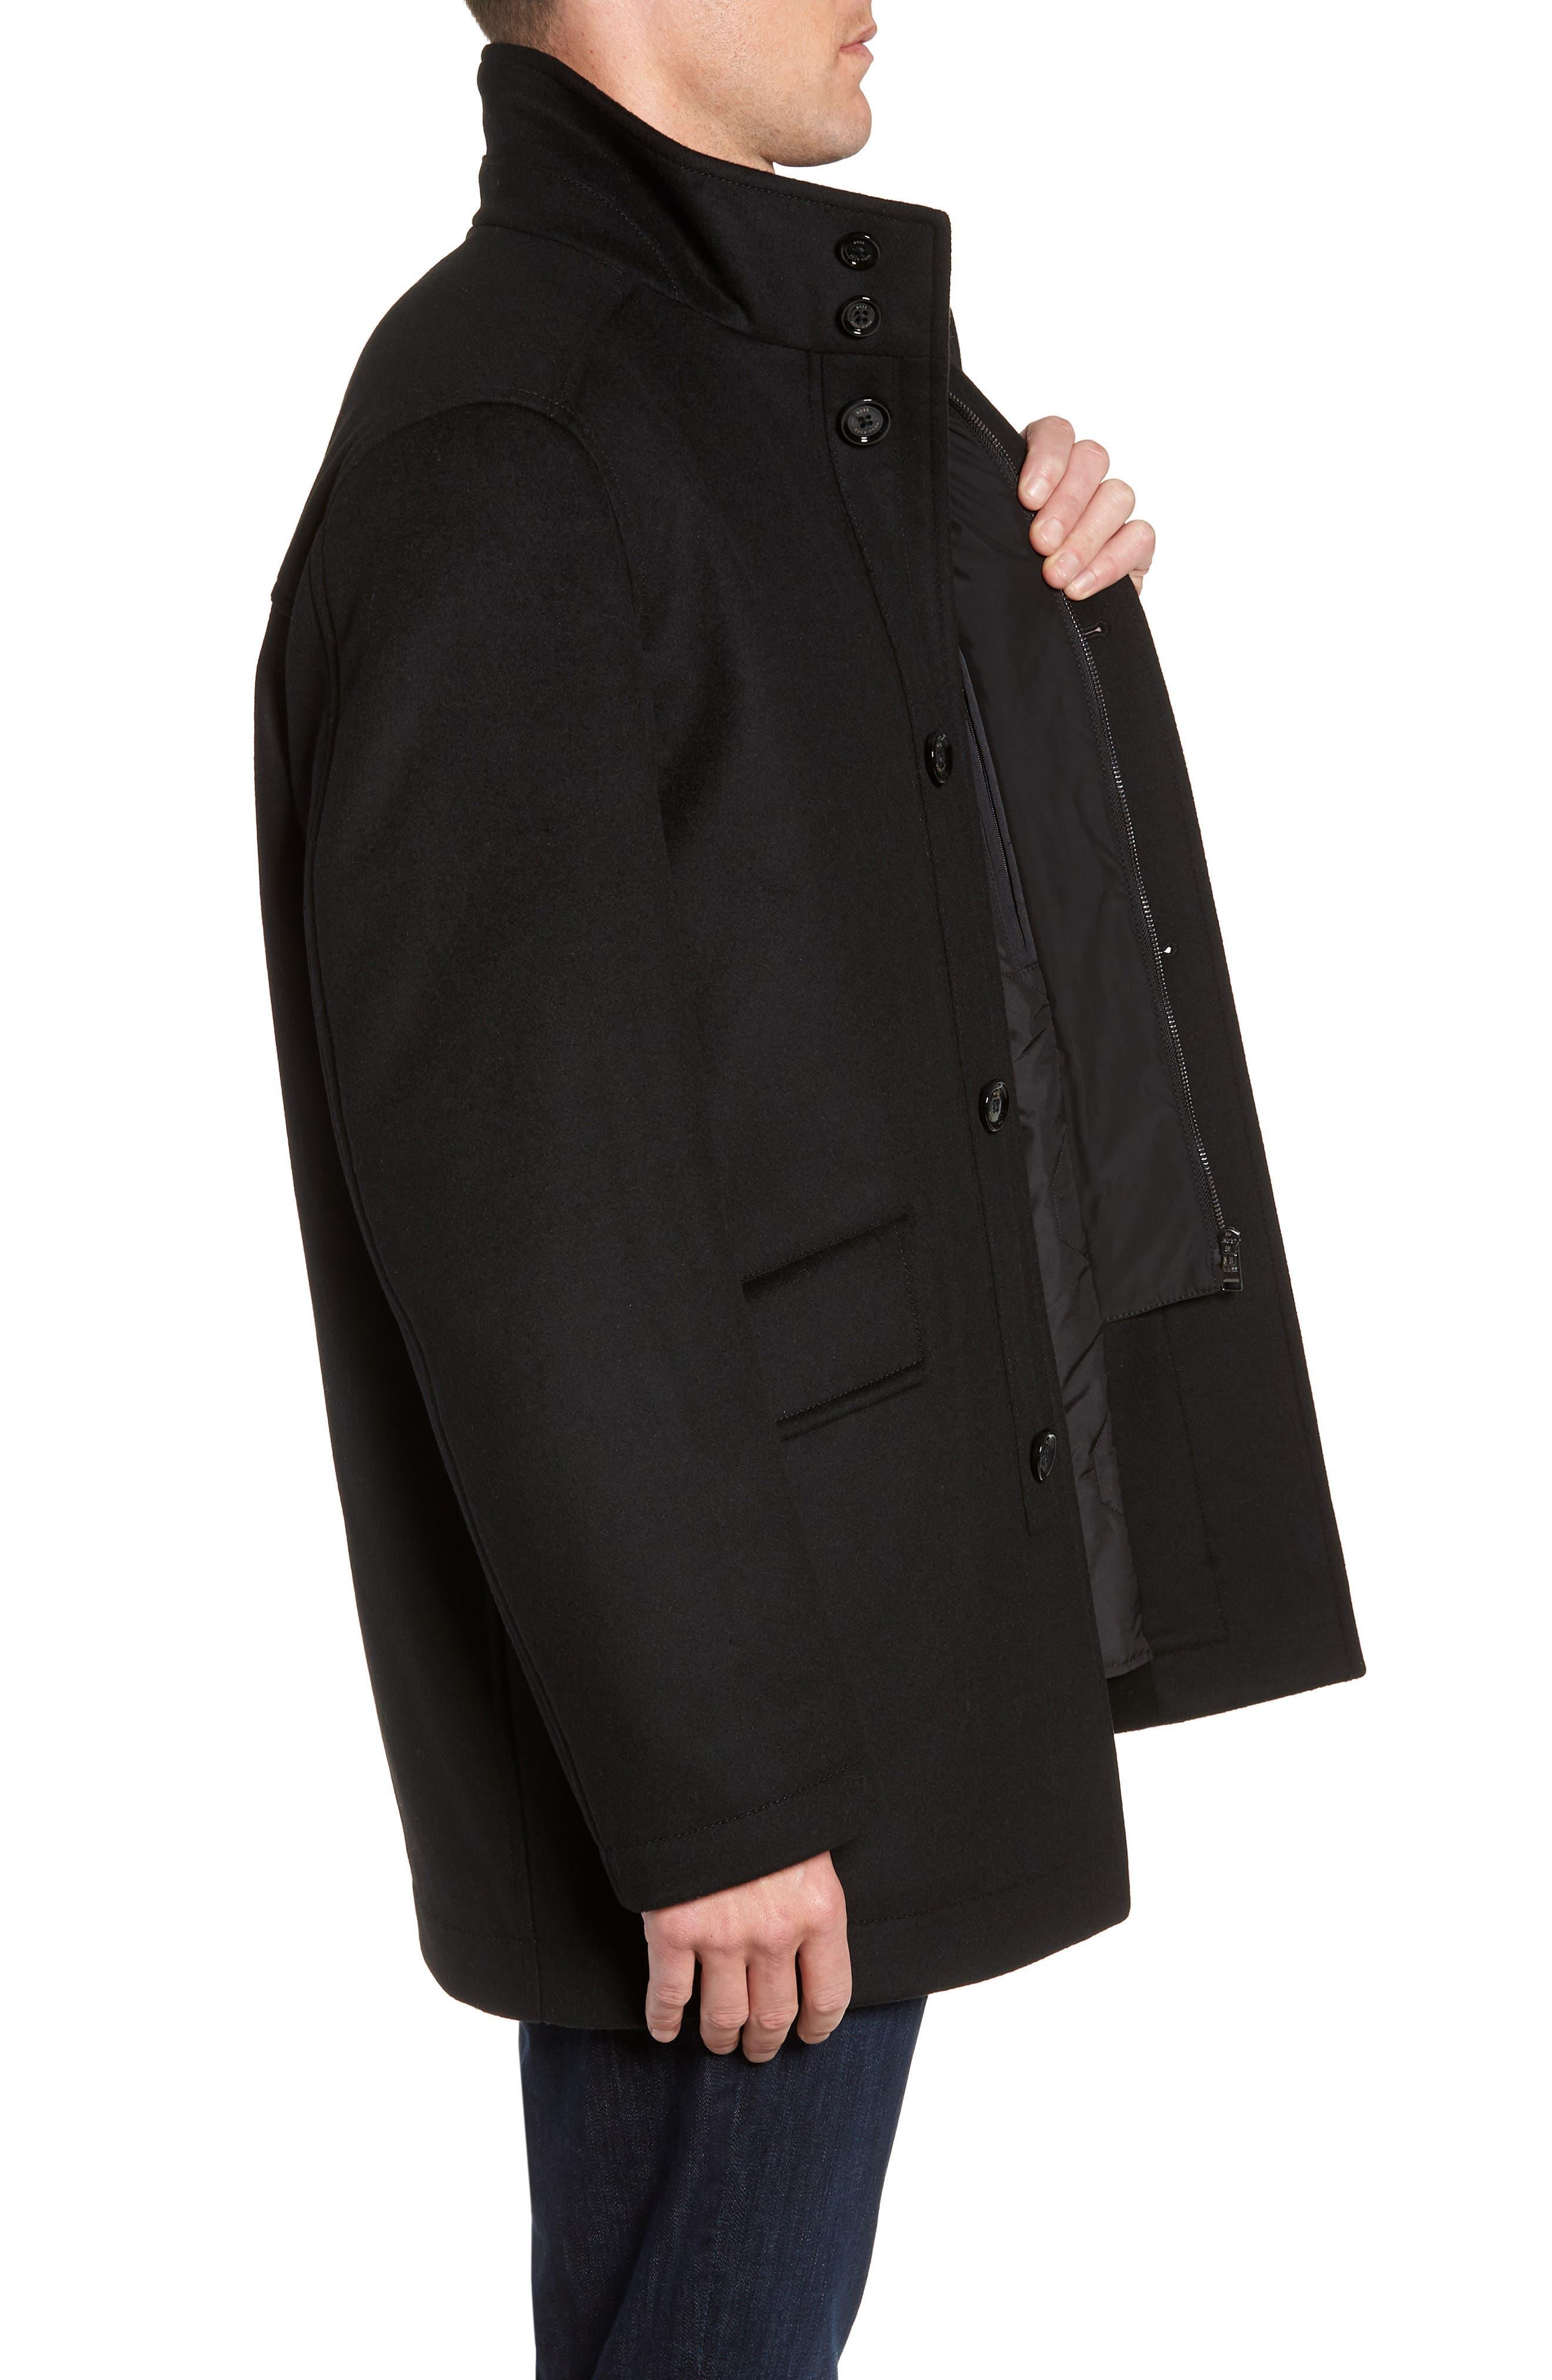 Coxtan Wool Regular Fit Car Coat,                             Alternate thumbnail 3, color,                             BLACK